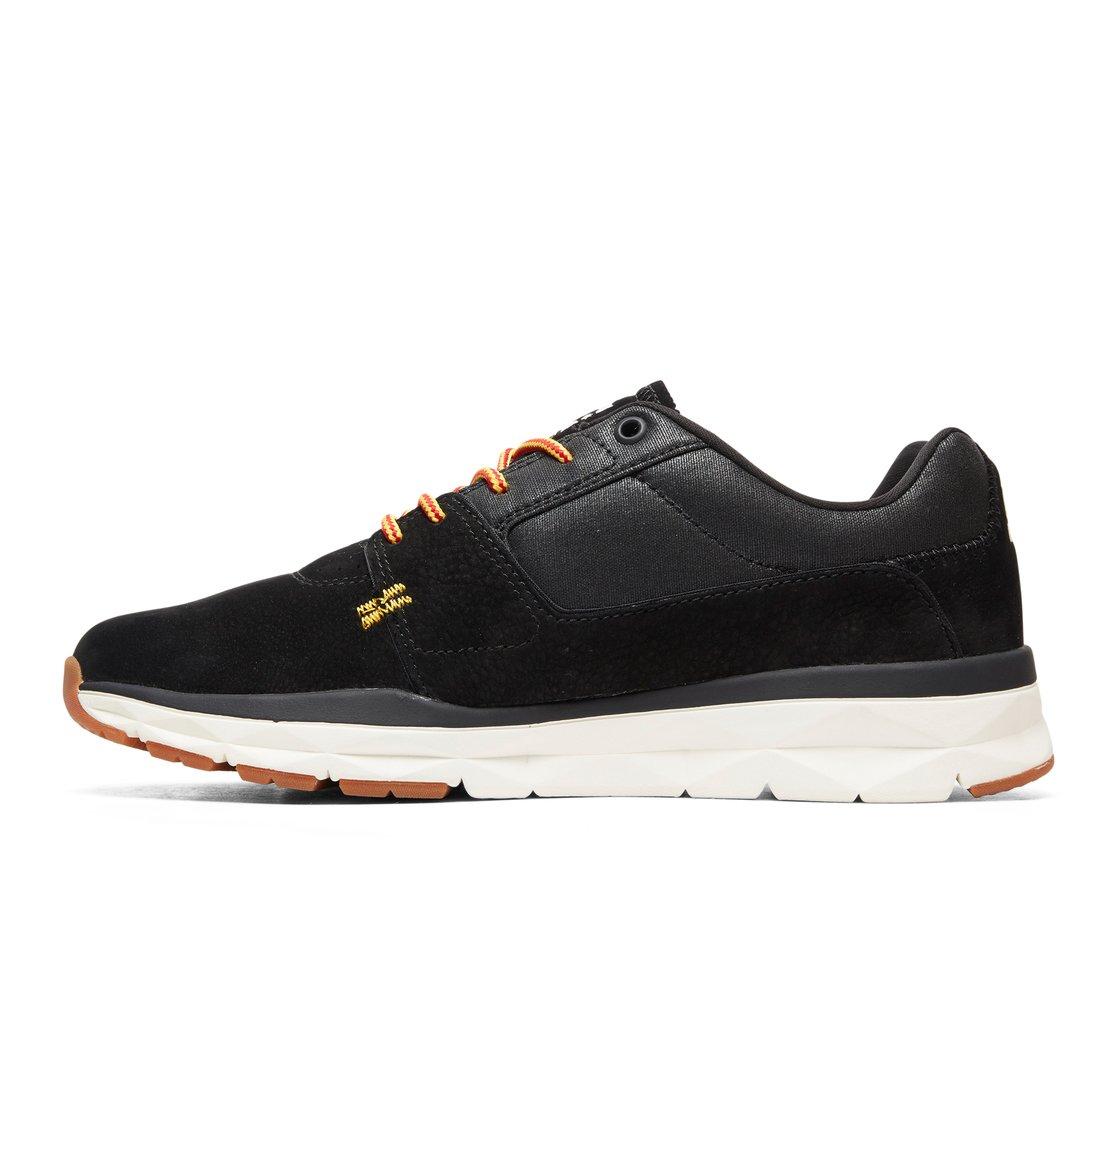 17f91f9c0a11a9 Chaussures homme Chaussures pour Homme ADYS700115 Dcshoes Chaussures et  Sacs DC Shoes Heathrow TX Le